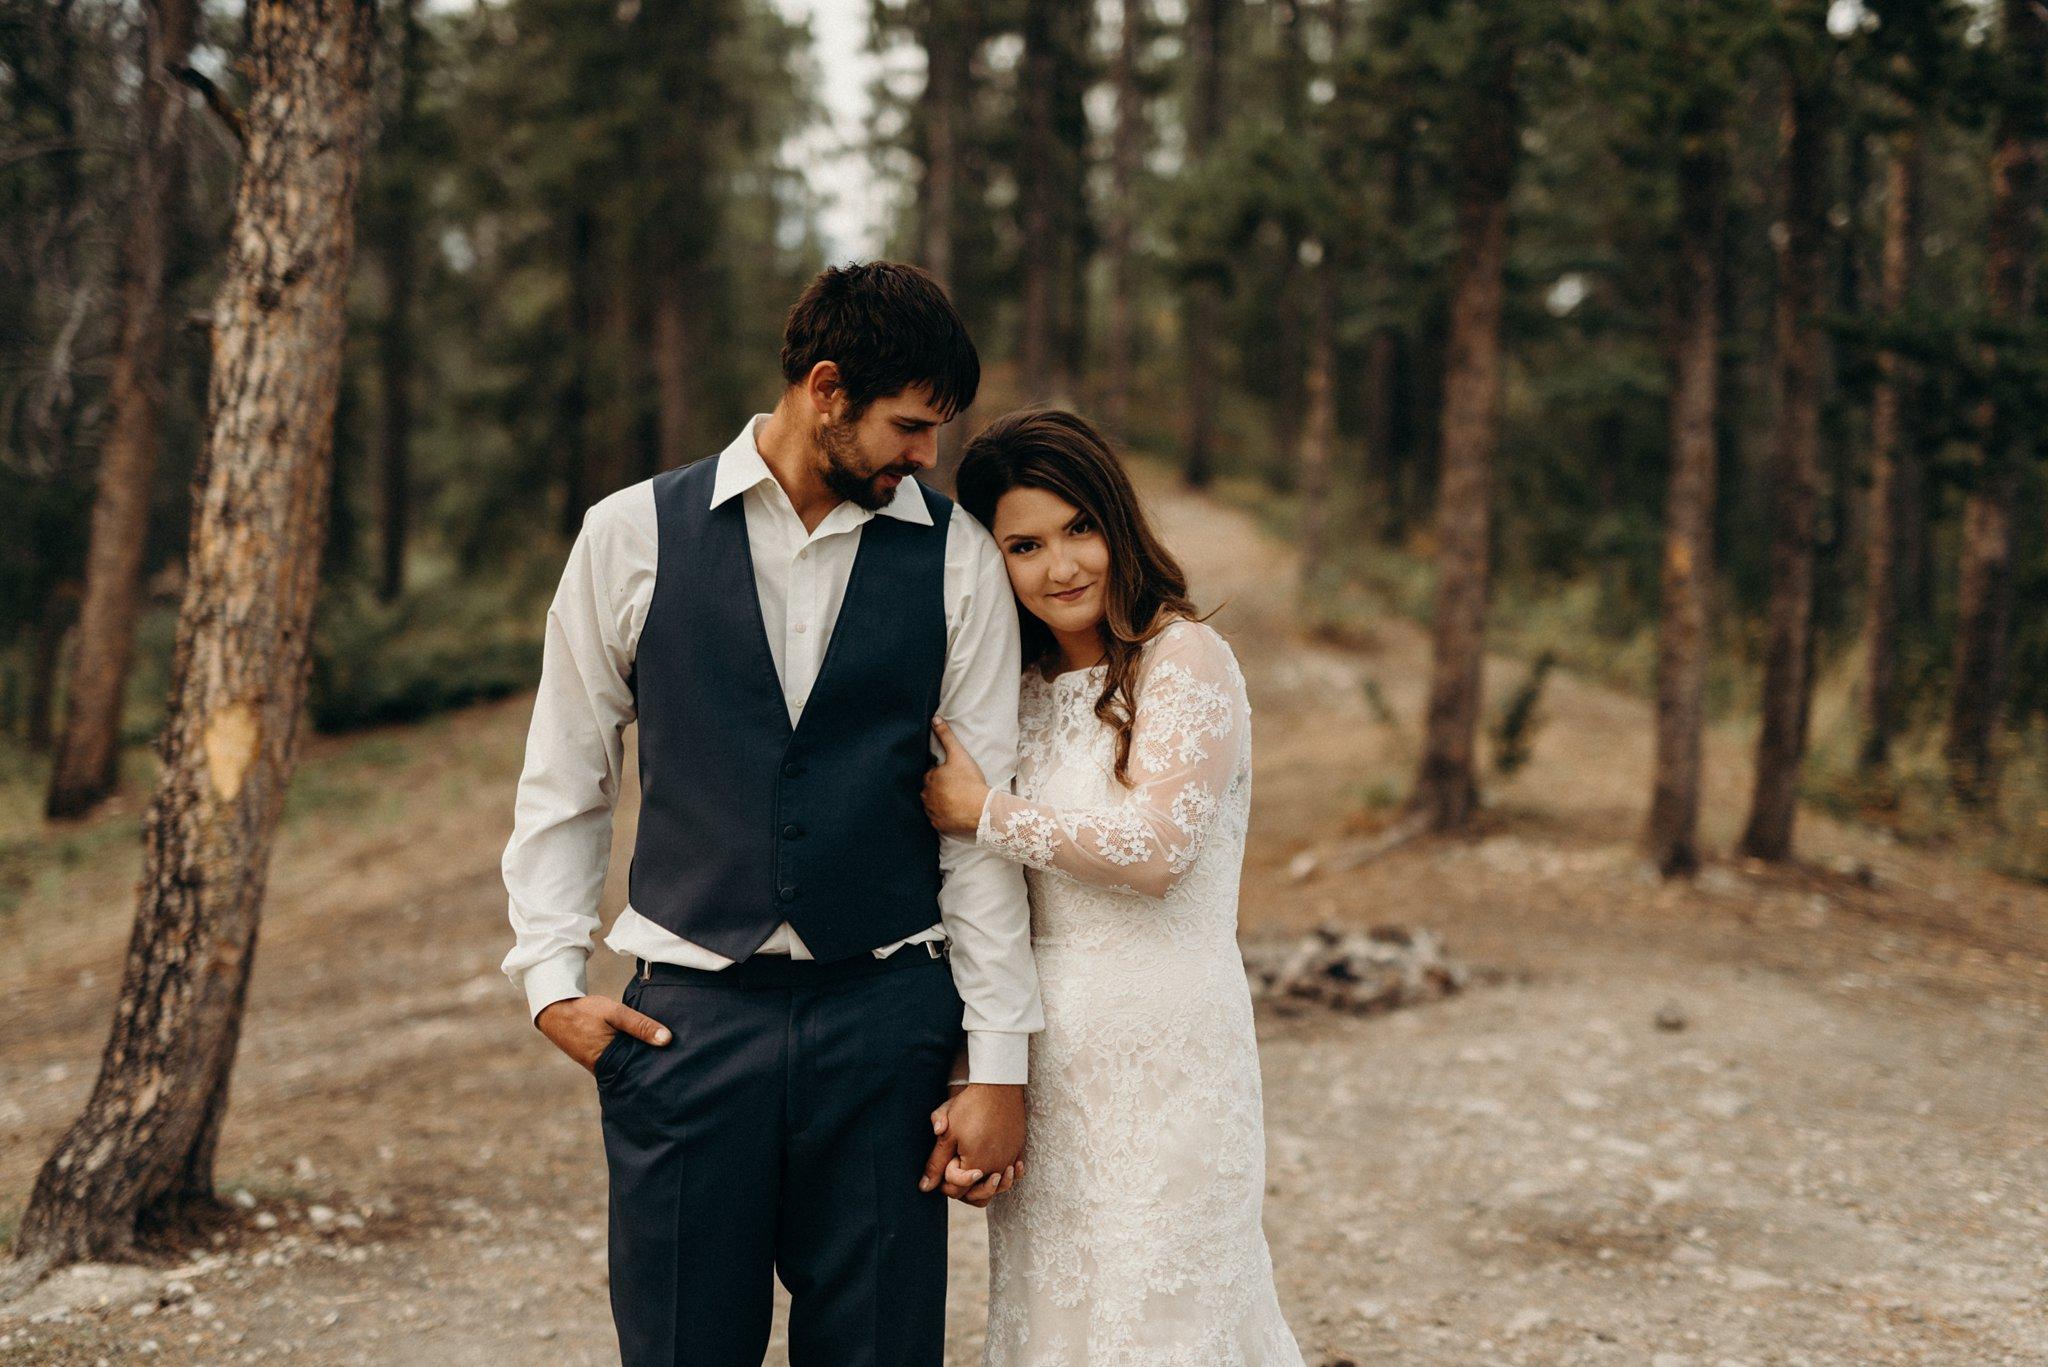 kaihla_tonai_intimate_wedding_elopement_photographer_6740.jpg